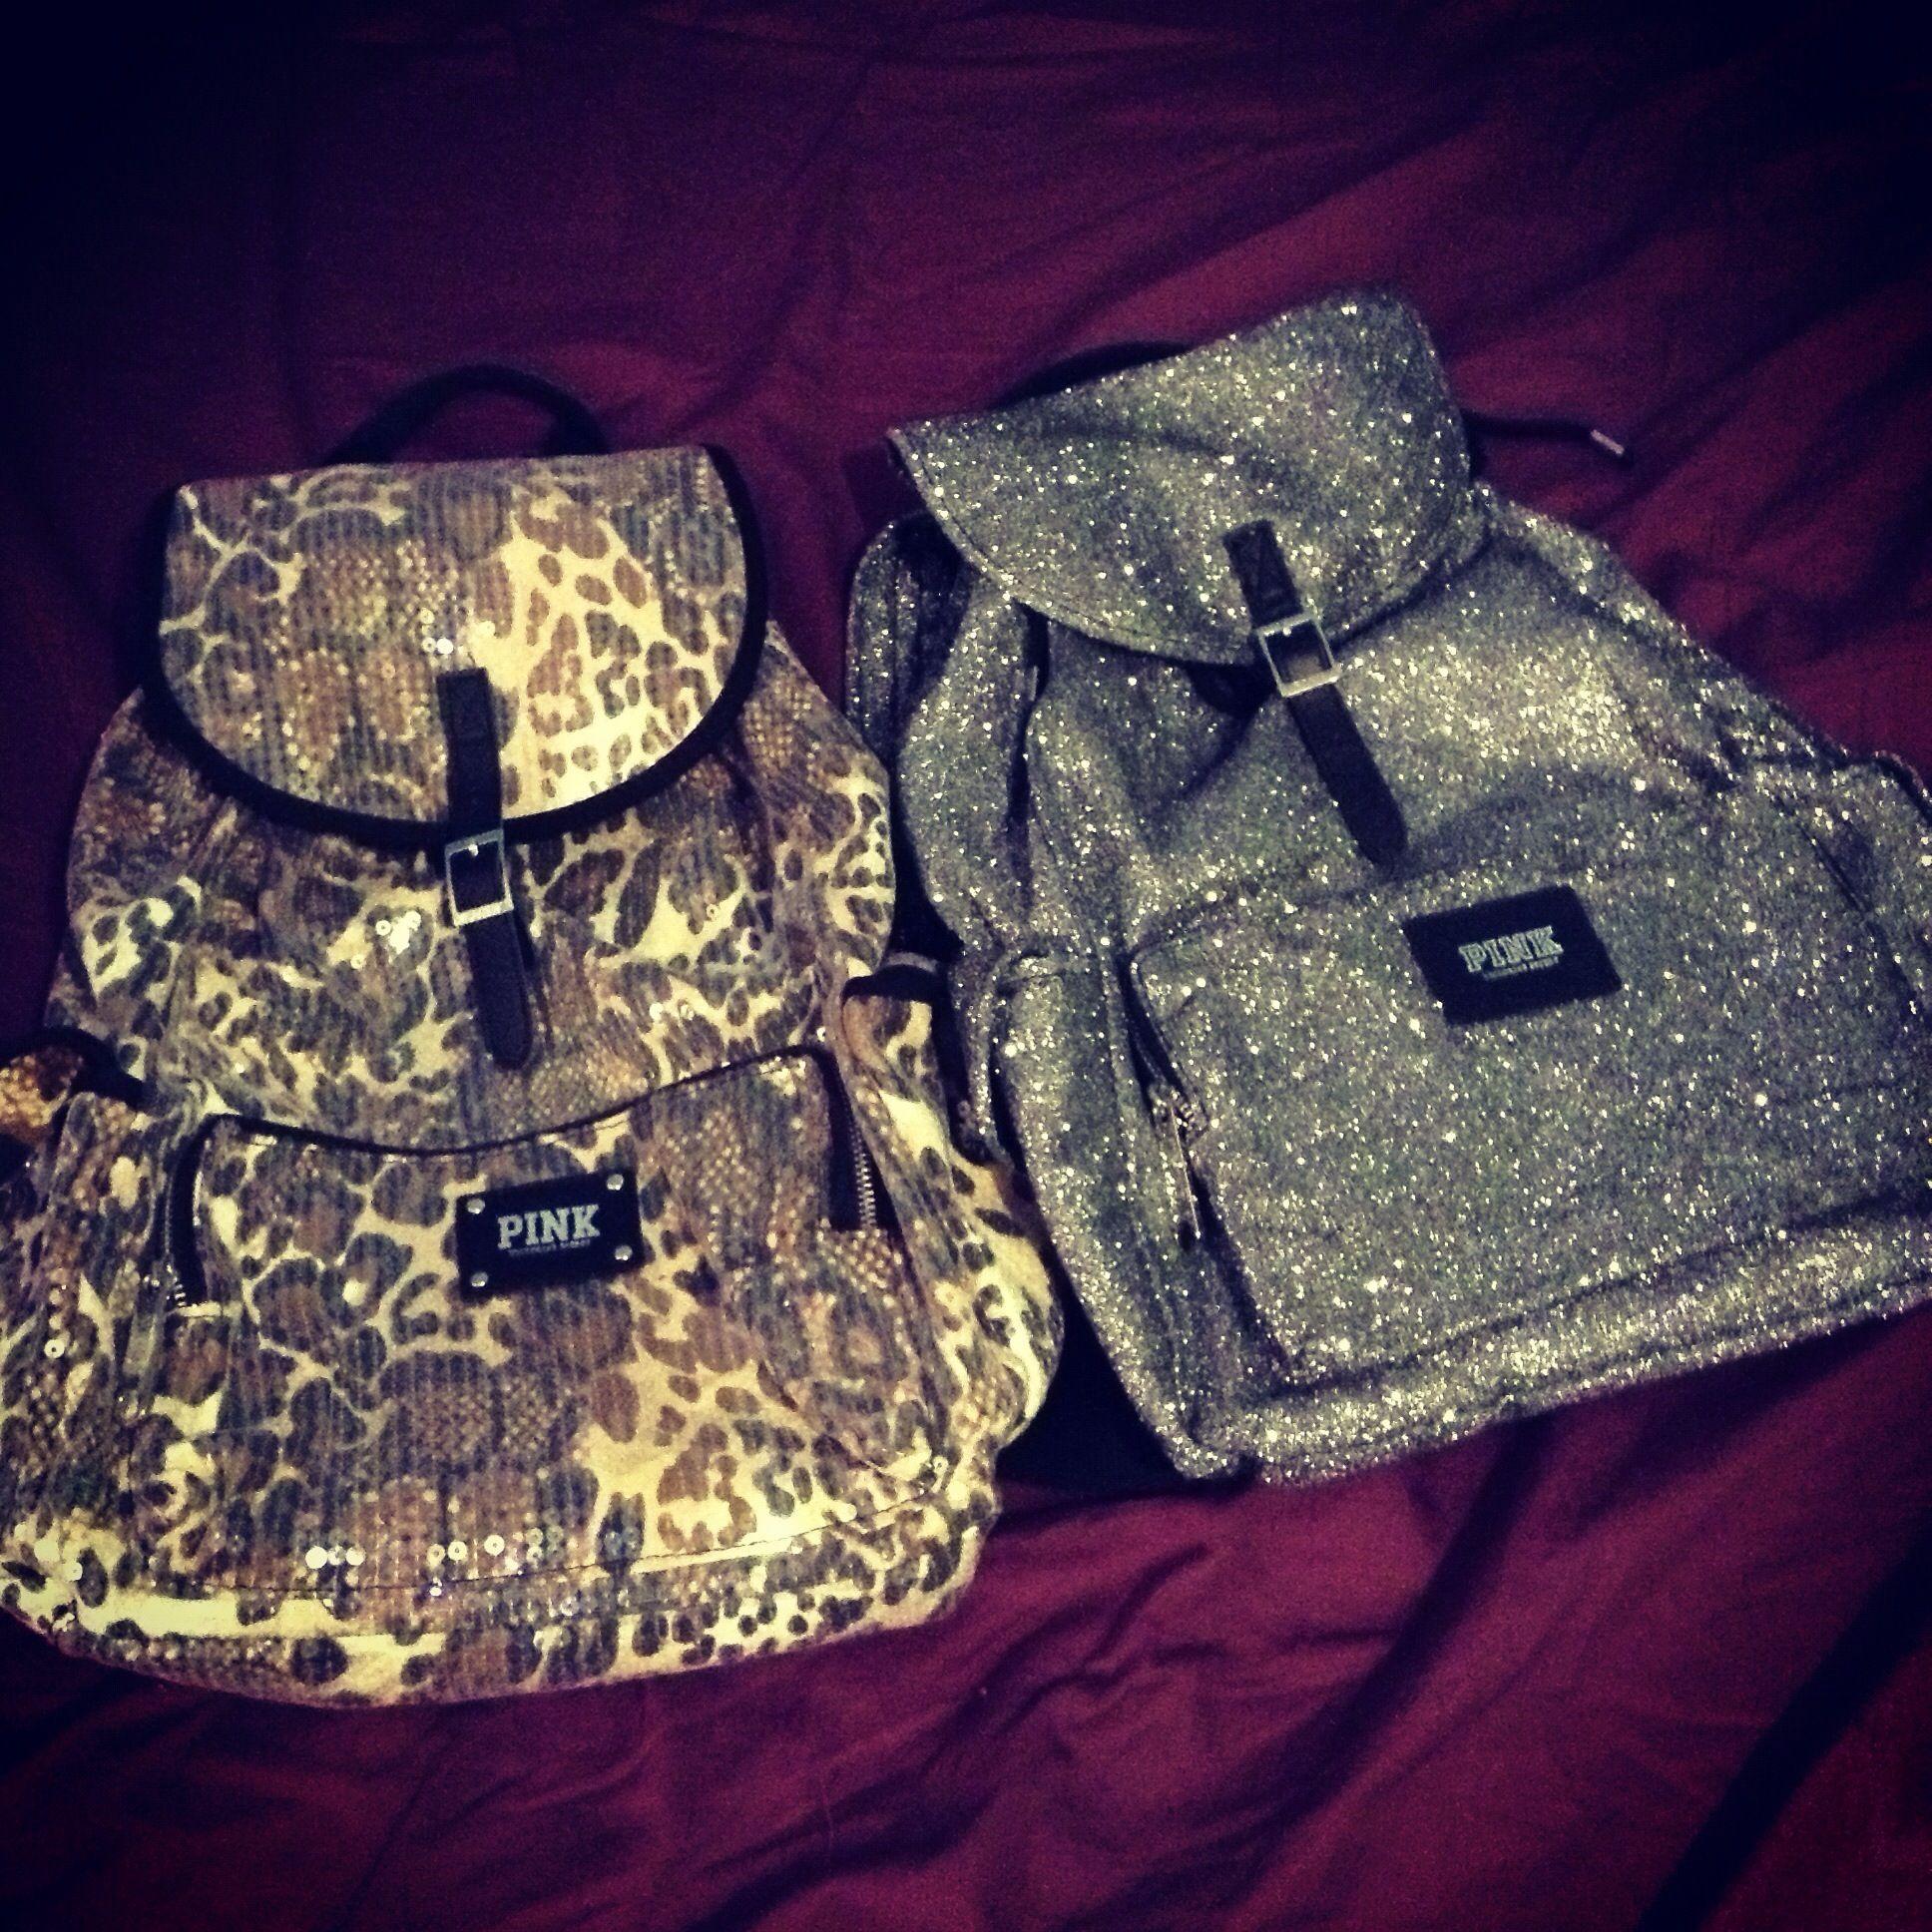 Victoria's Secret PINK Backpack, silver glitter & leopard